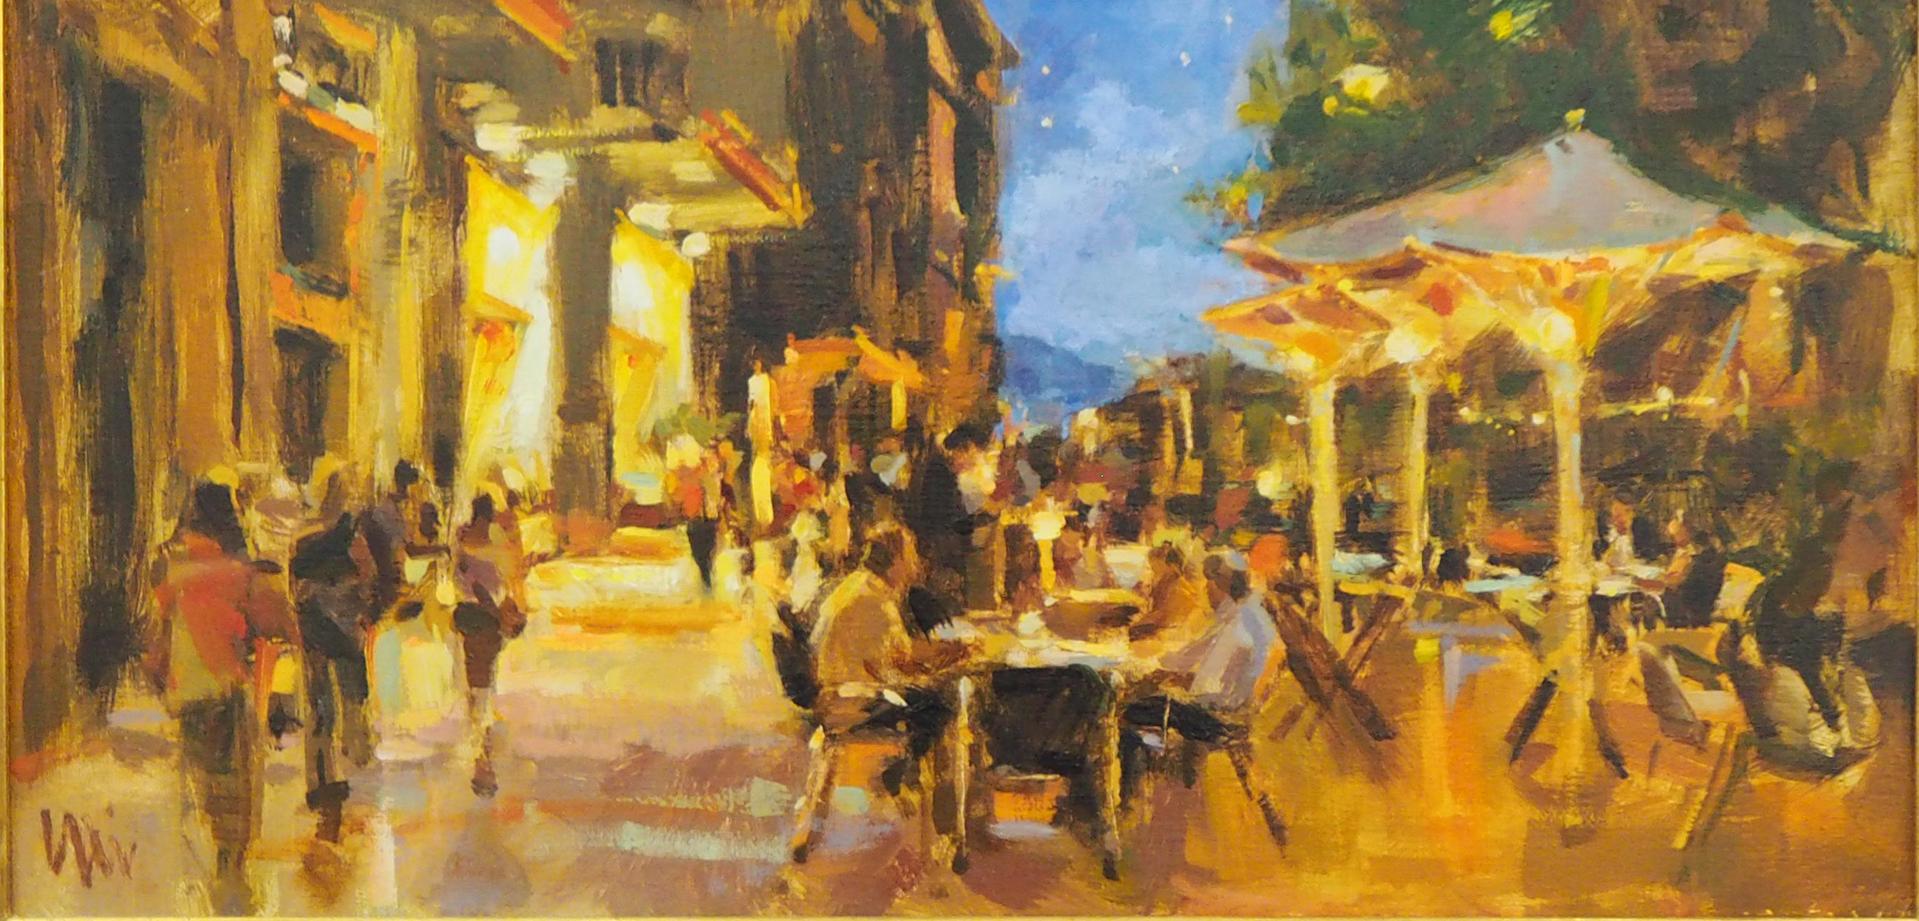 Cafe De Nuit  by Eli Cedrone